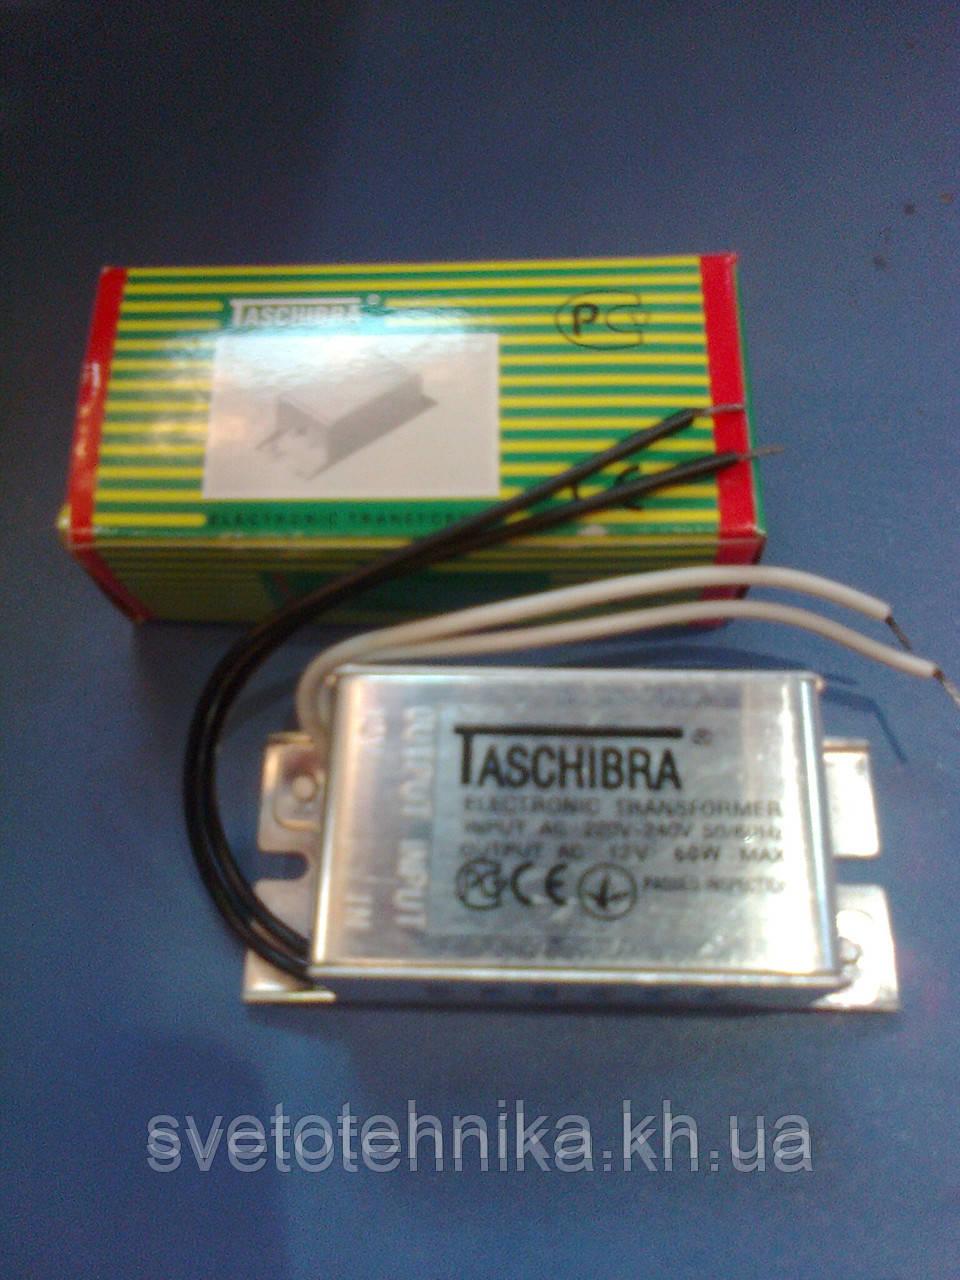 Трансформатор понижающий для галогенных ламп 12V Feron 105W / TRA 25 (TASHIBRA)